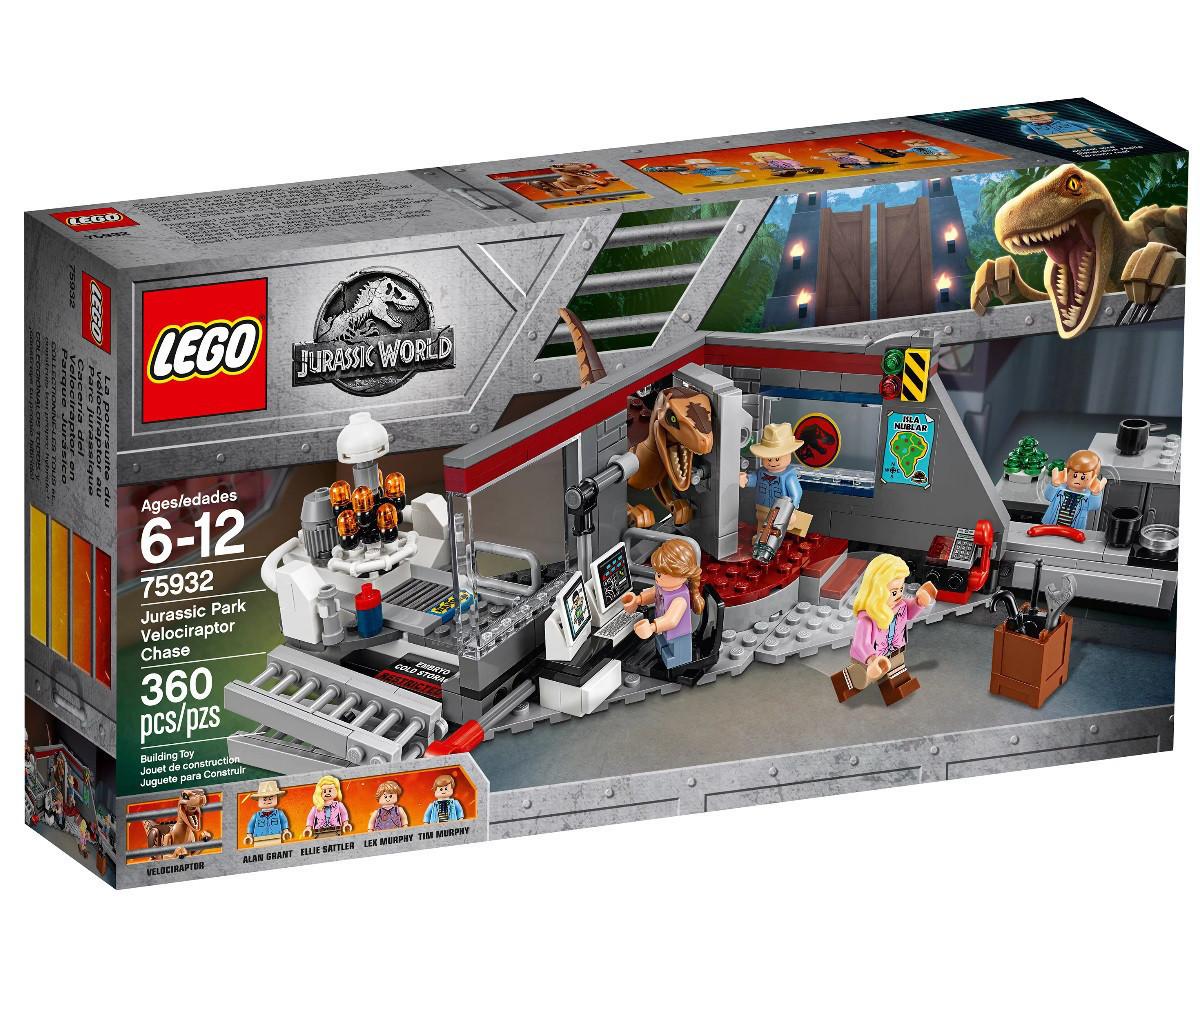 Lego Jurassic World Охота на Рапторов в Парке Юрского Периода 75932